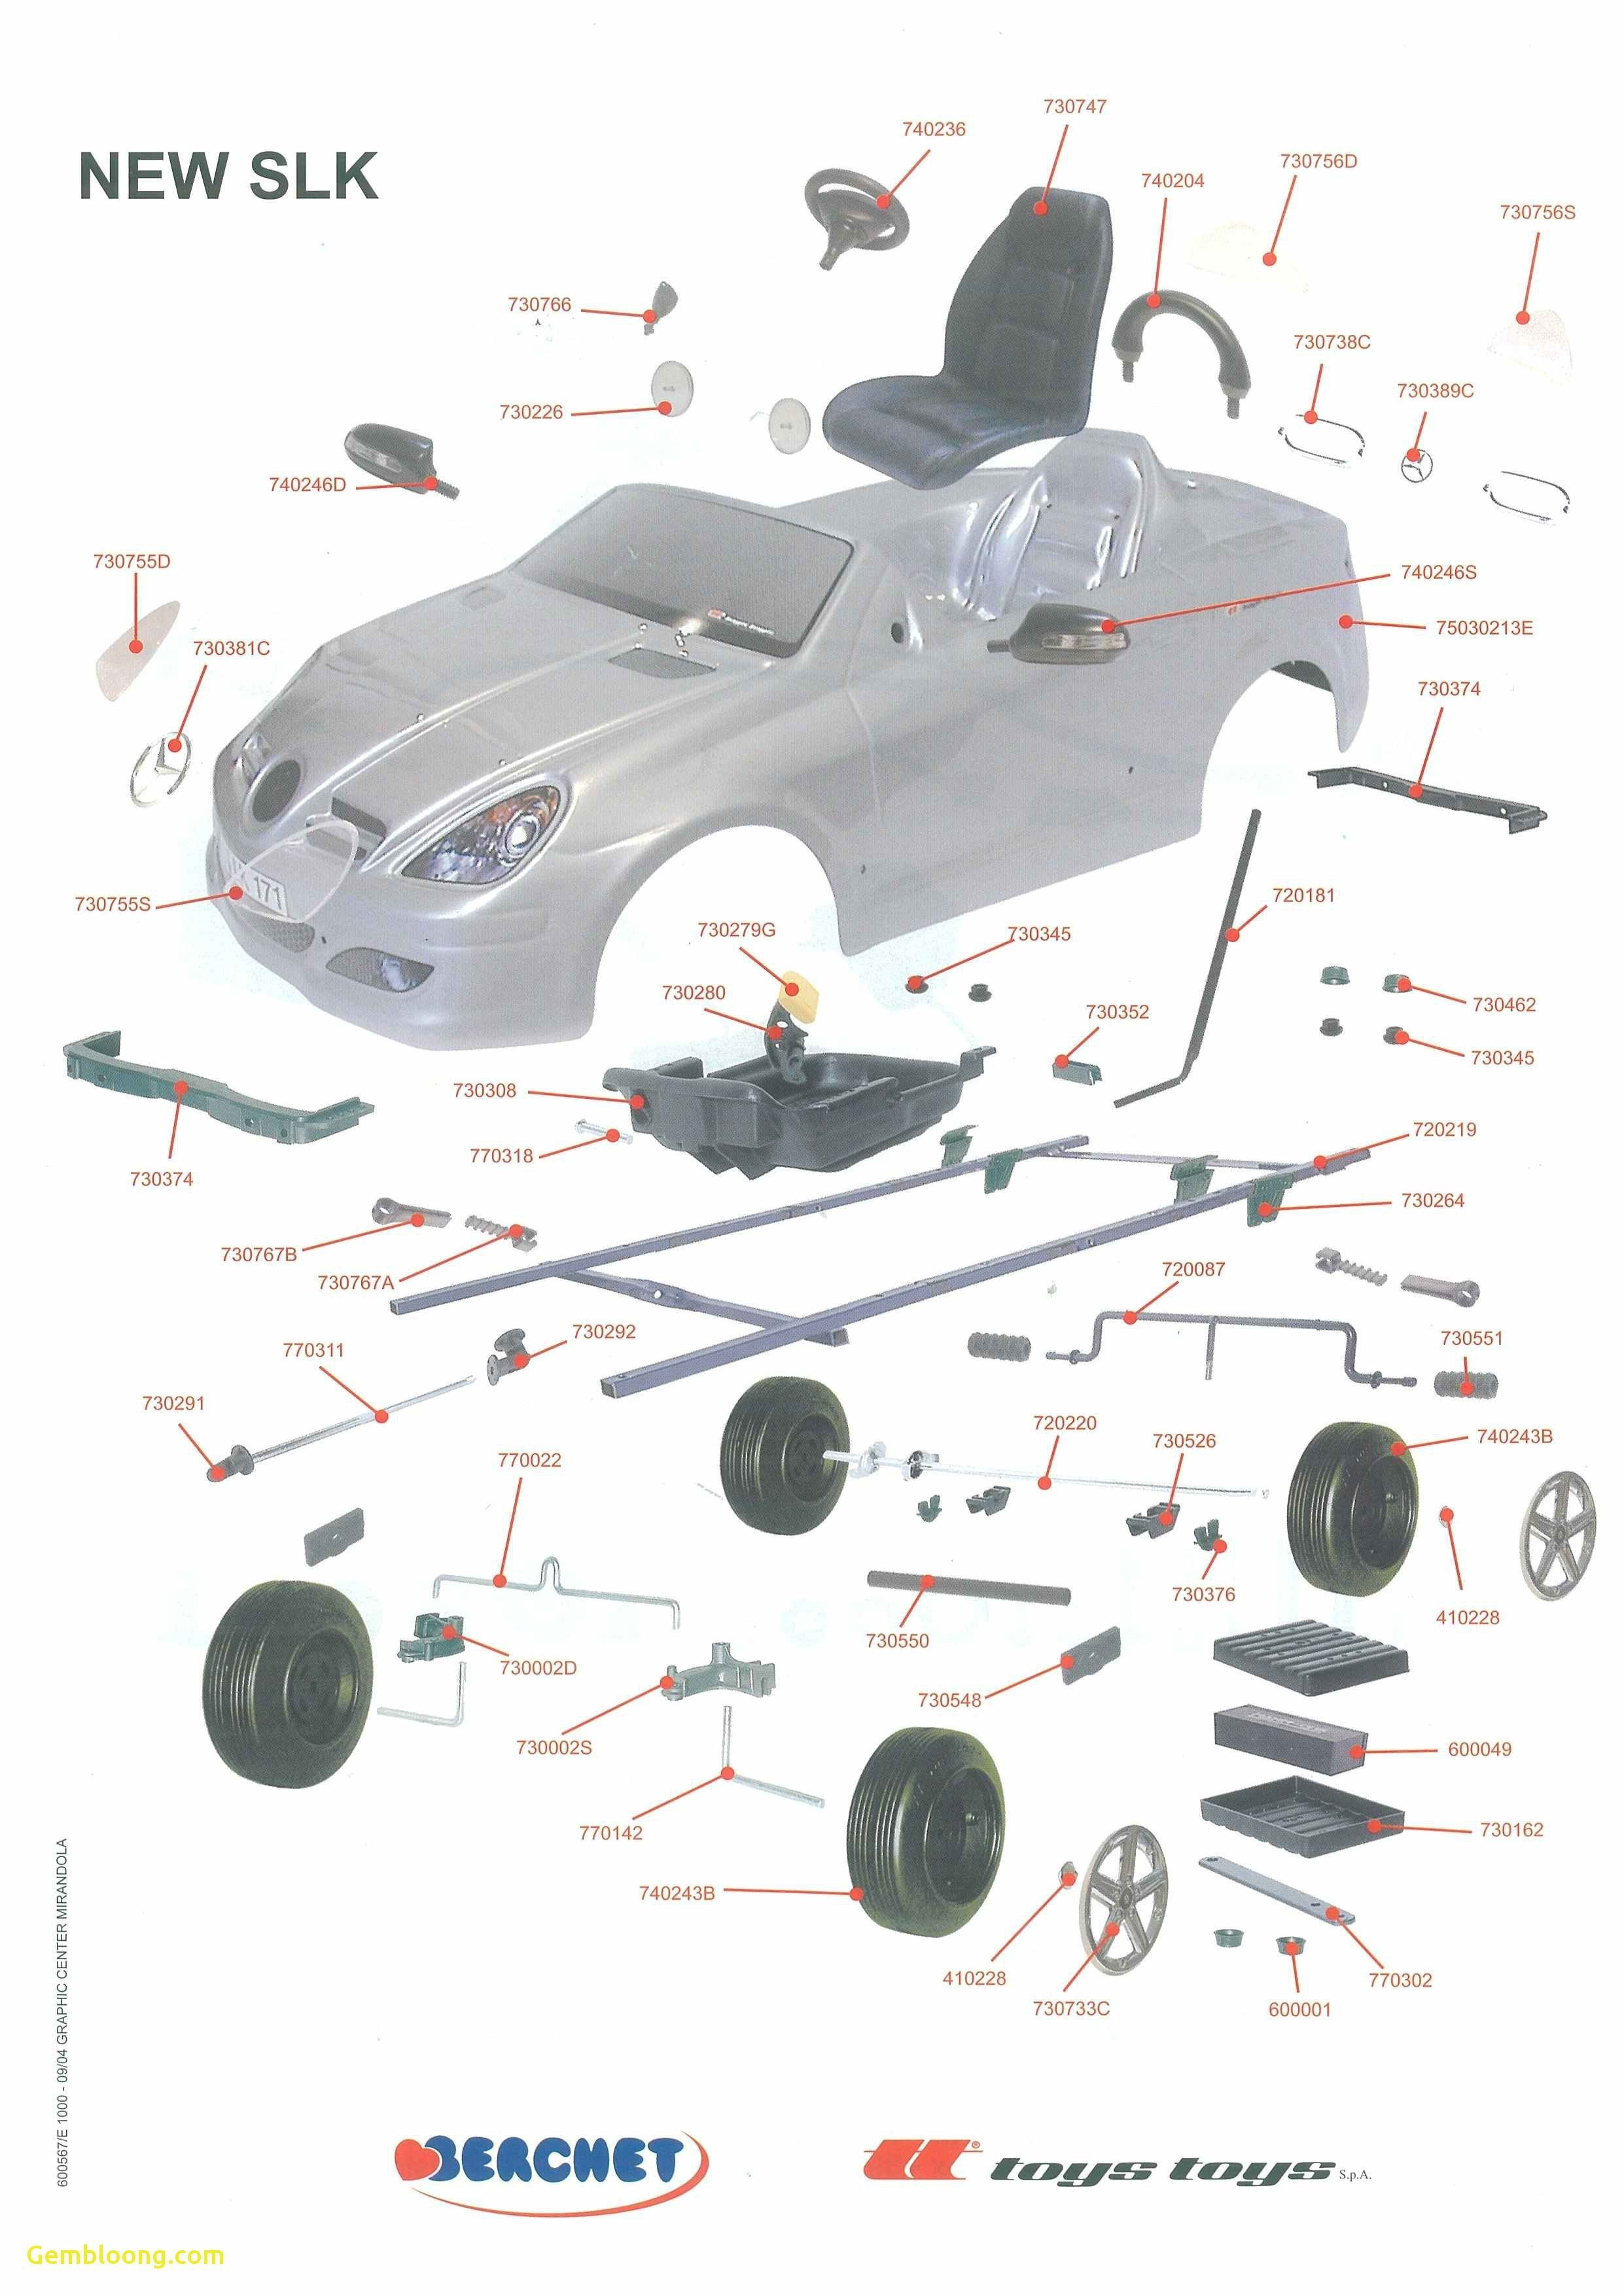 Car Diagram Parts Awesome Car Free Body Diagram – My Wiring DIagram